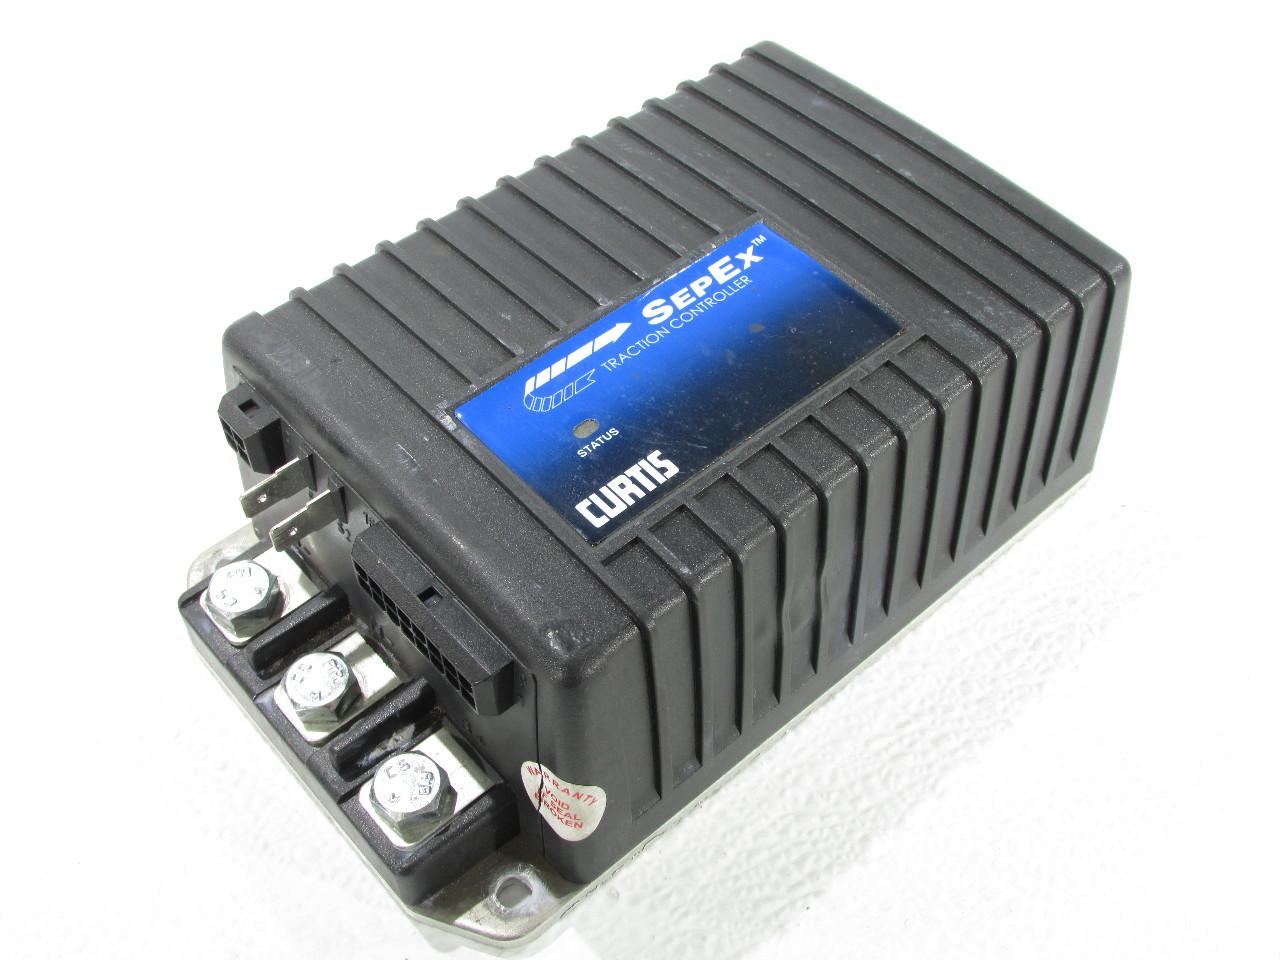 Curtis 1243c4378 dc motor controller premier equipment for Curtis dc motor controller 1243